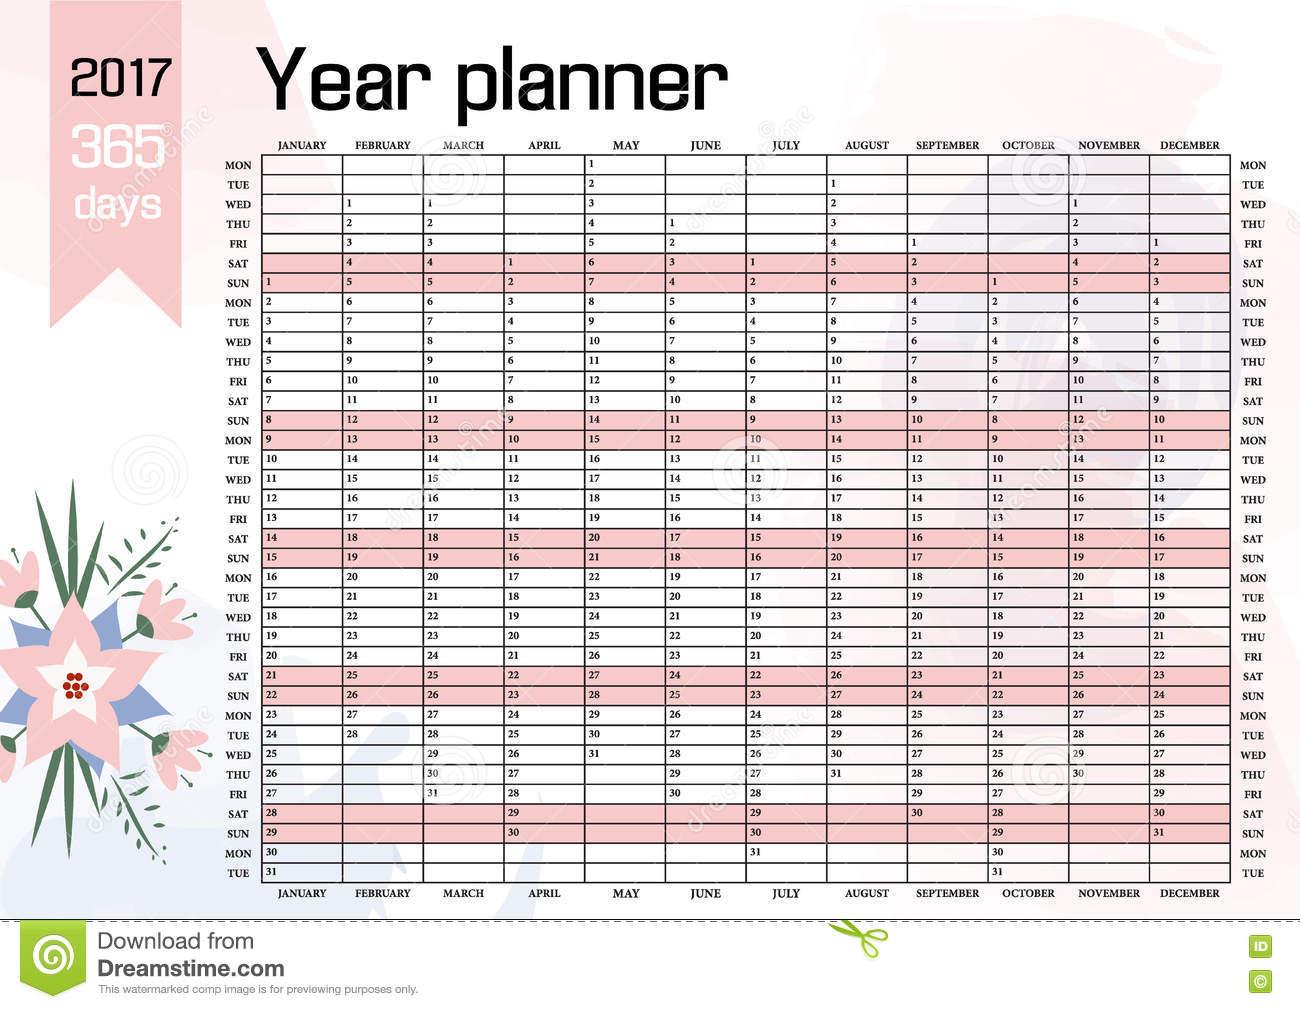 Six Year Calendar 2017 2018 2019 2020 2021 And 2022